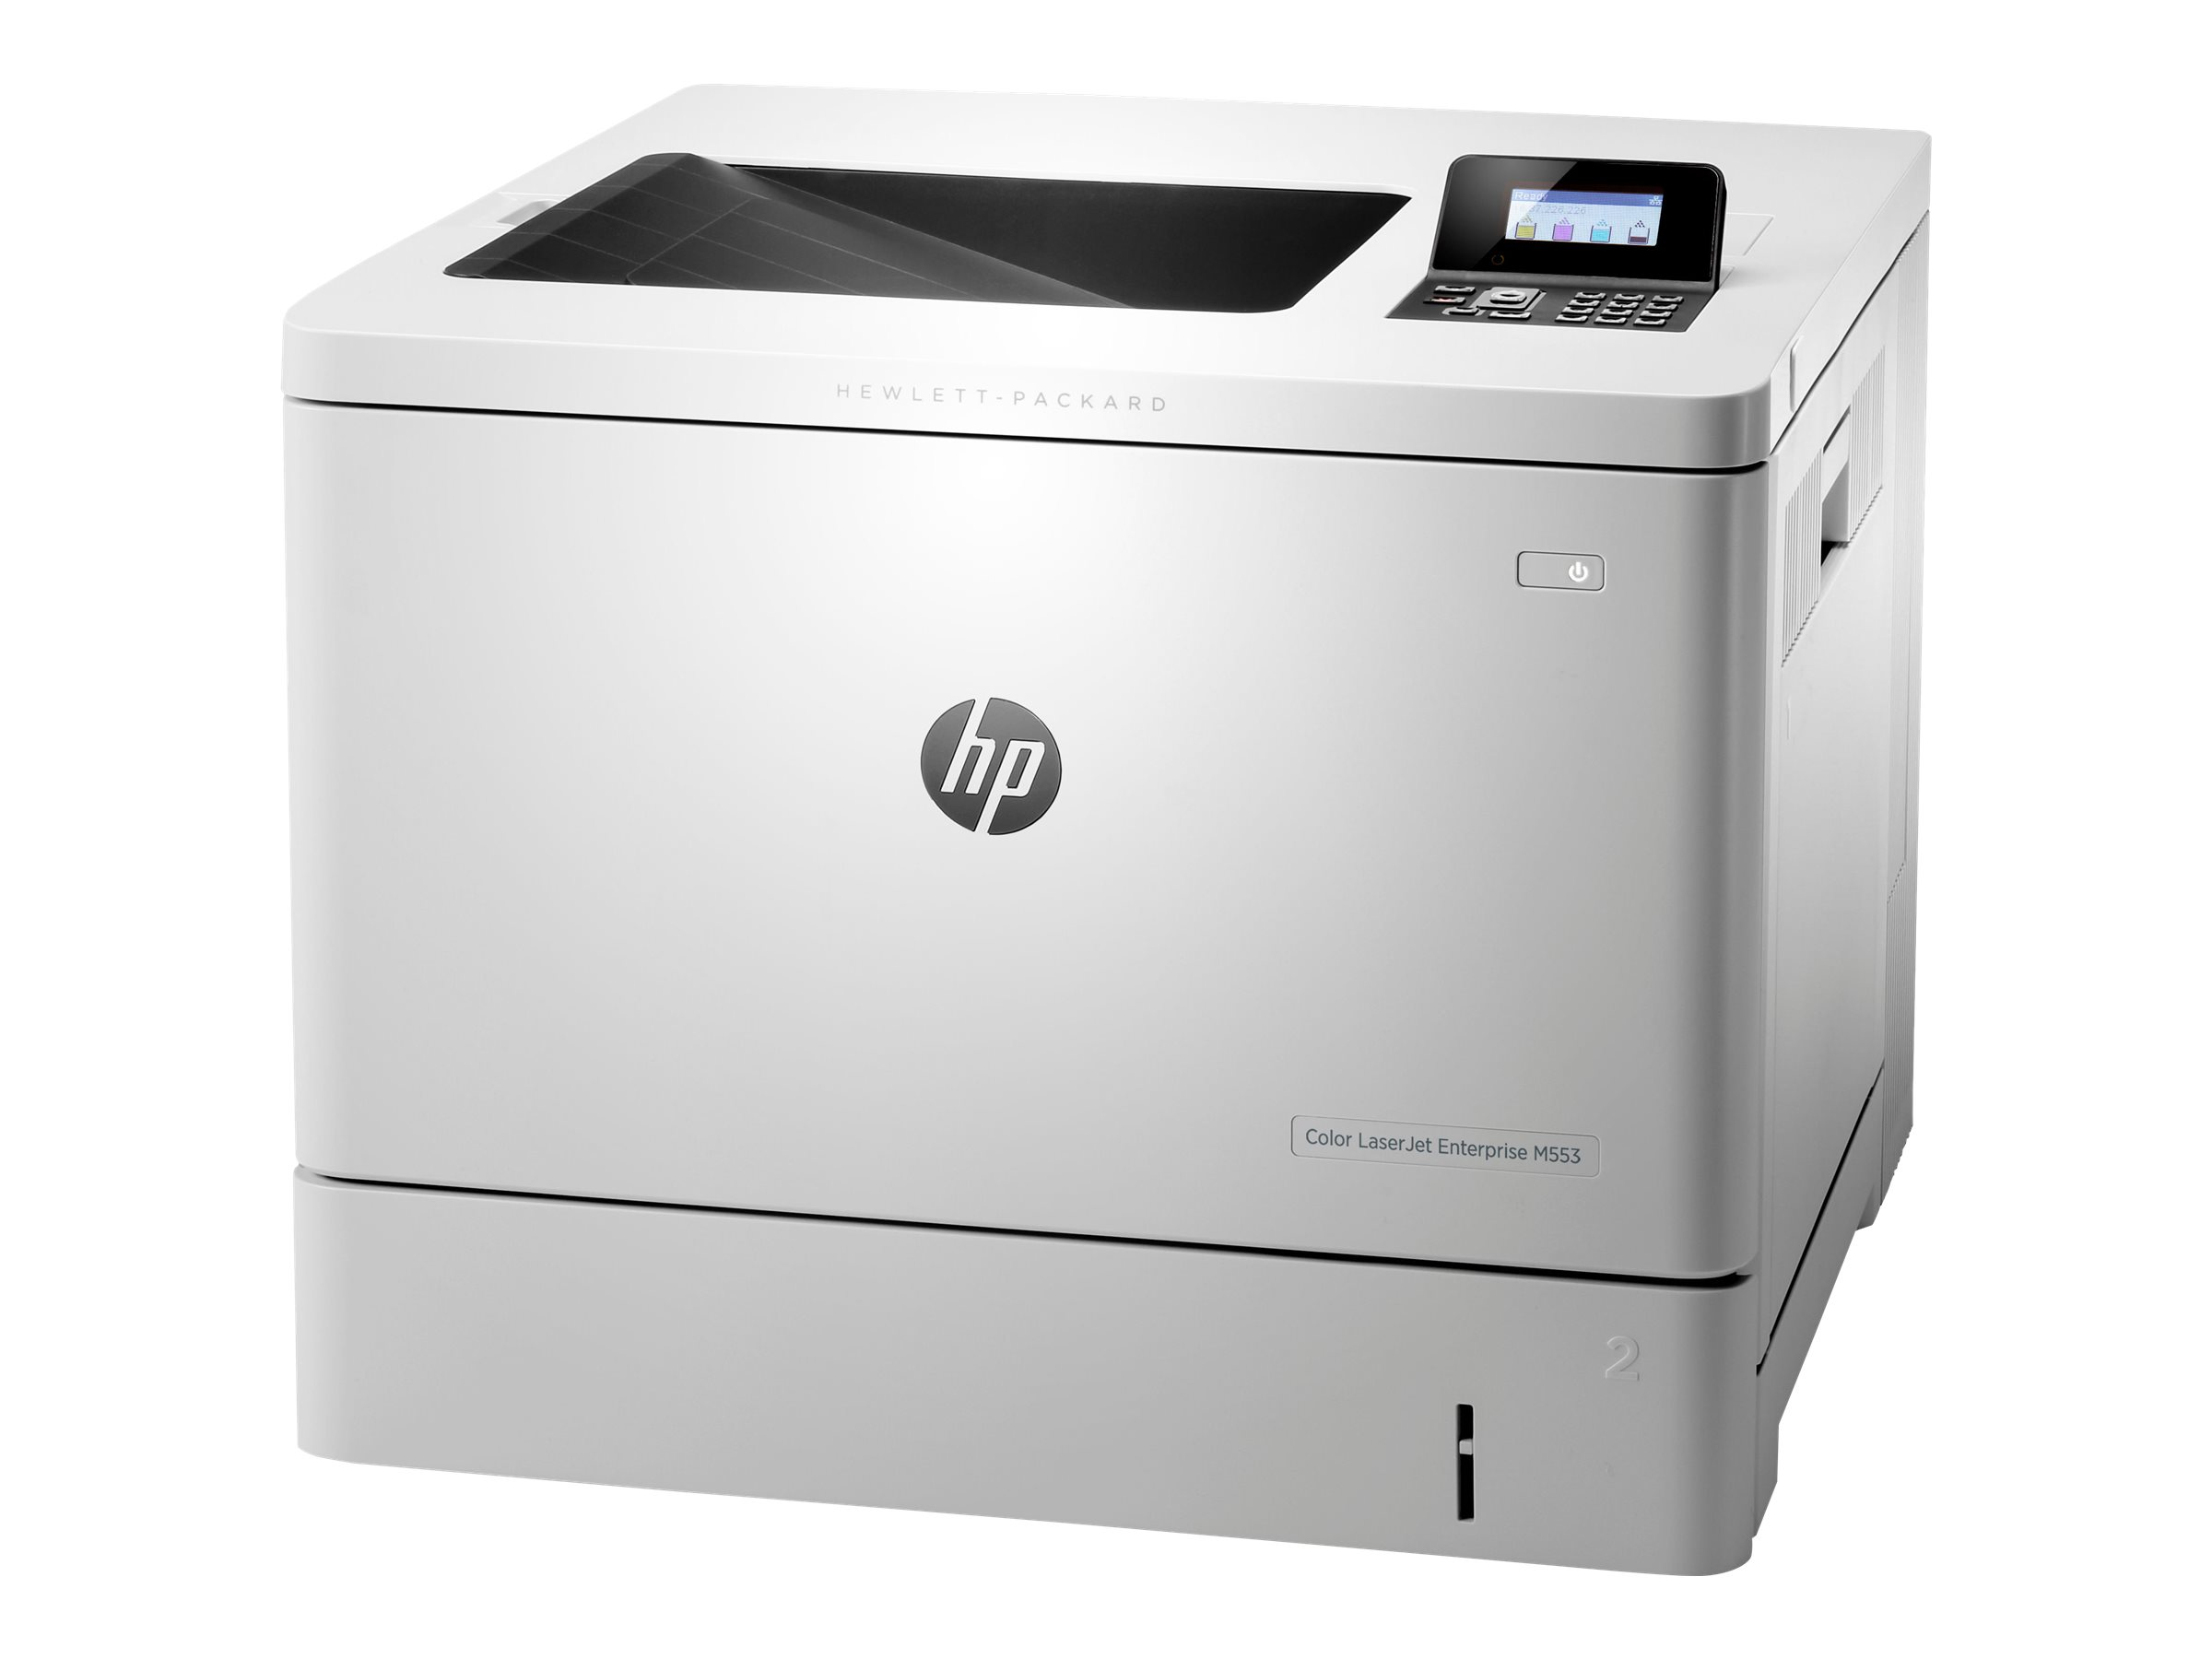 HP Color LaserJet Enterprise M553dn - Drucker - Farbe - Duplex - Laser - A4/Legal